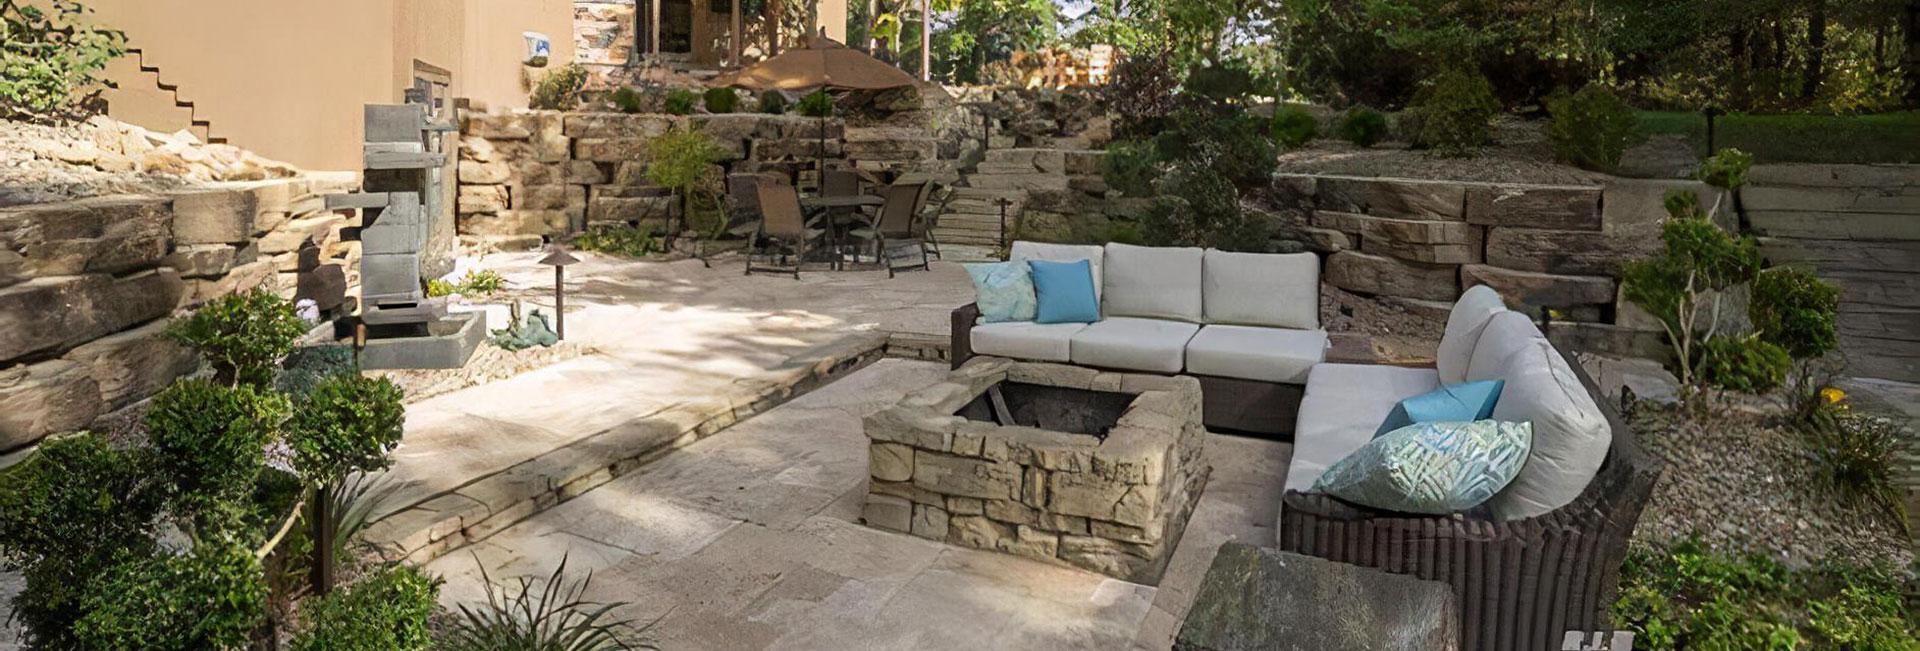 Residential backyard landscaping